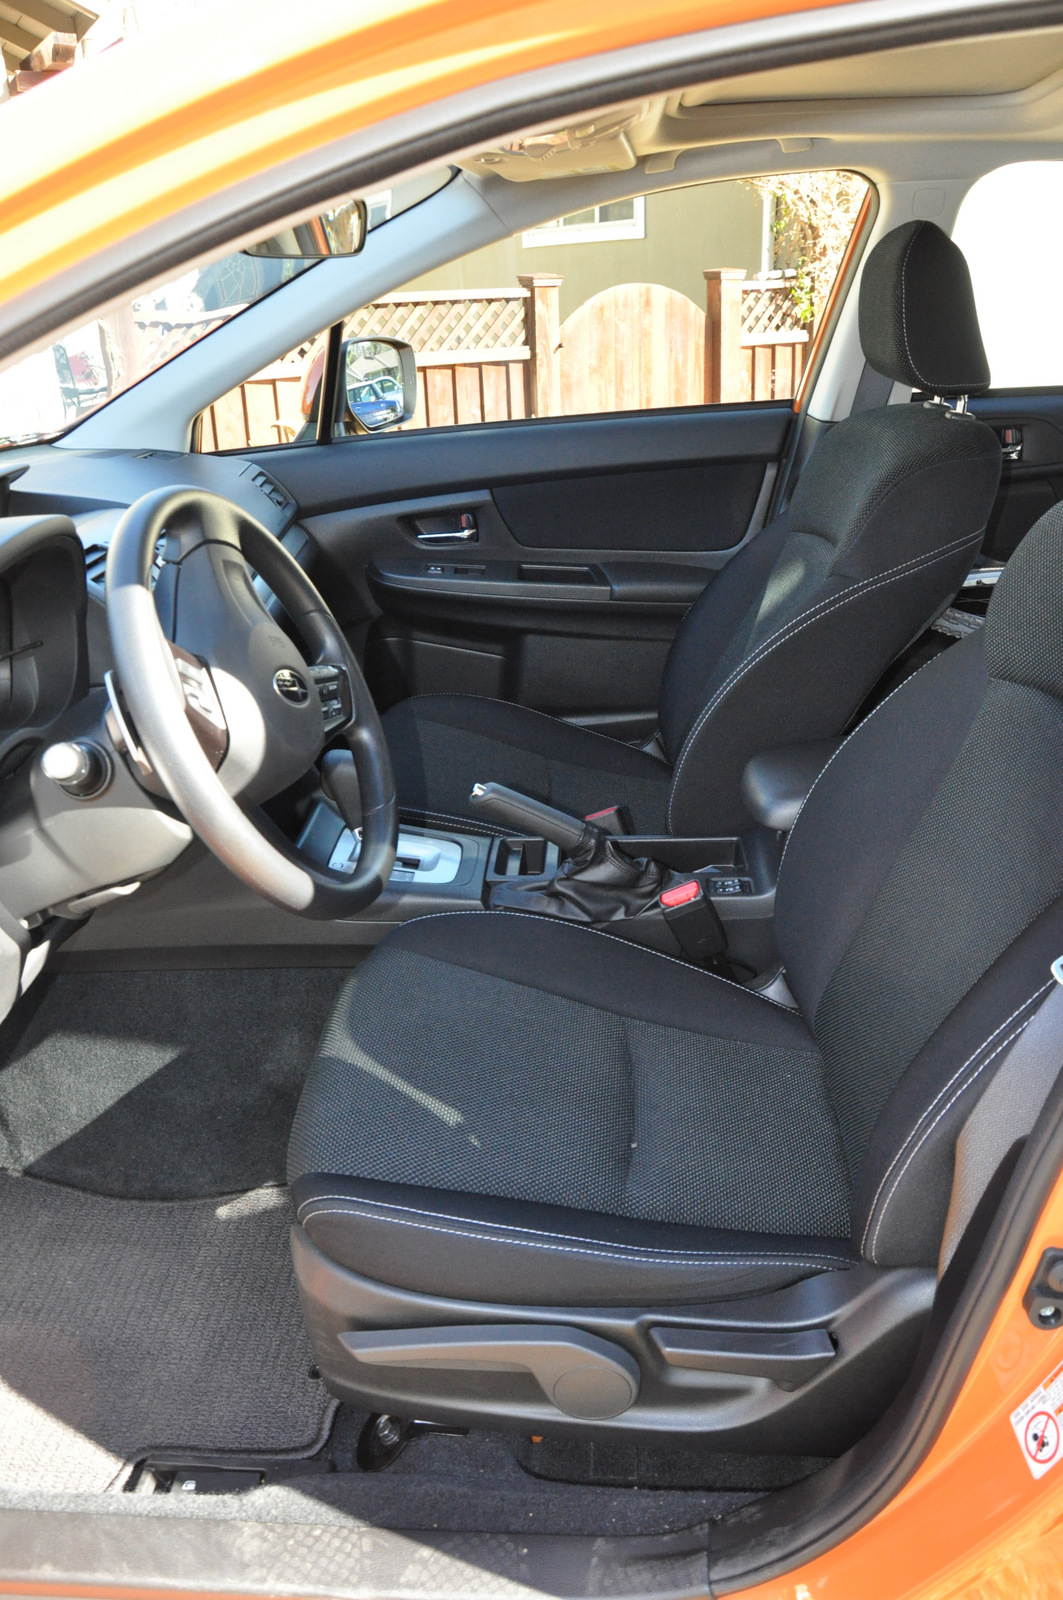 Subaru XV Crosstrek drivers's seat